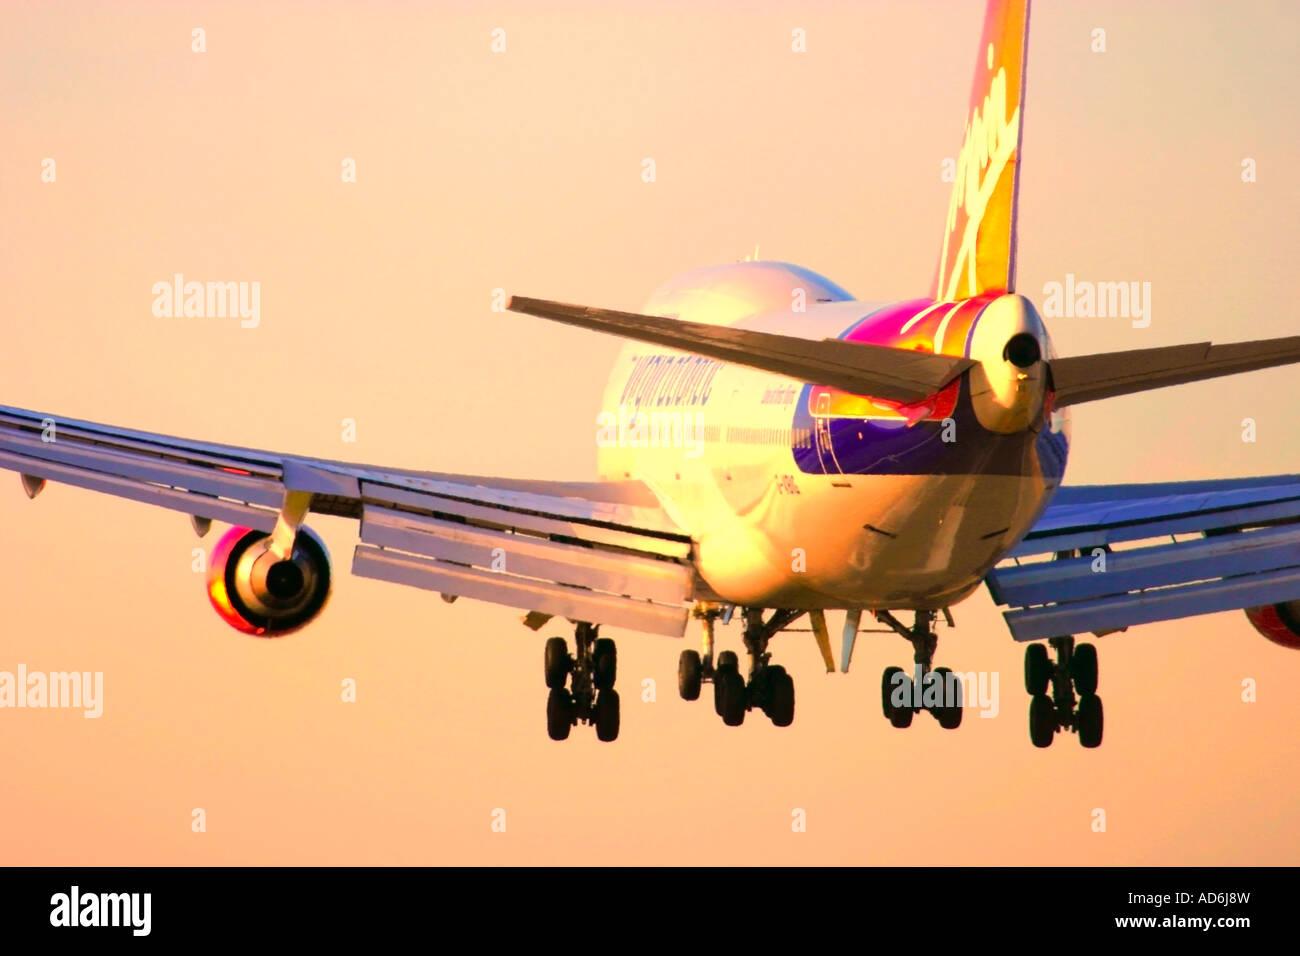 Virgin Atlantic Airways aeroplane - Stock Image